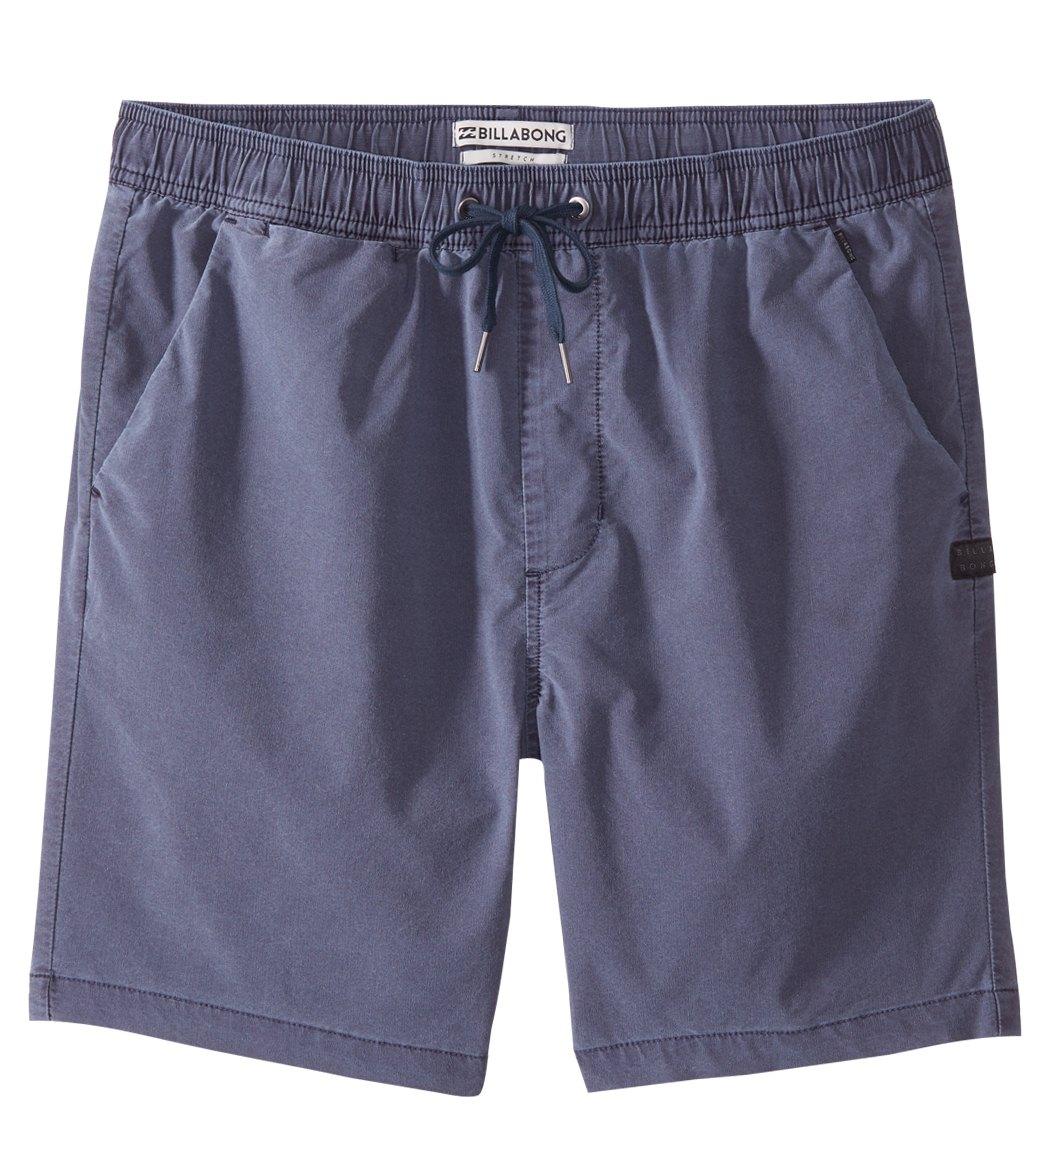 Billabong Men s Larry Layback Shorts at SwimOutlet.com - Free Shipping adcf47926004